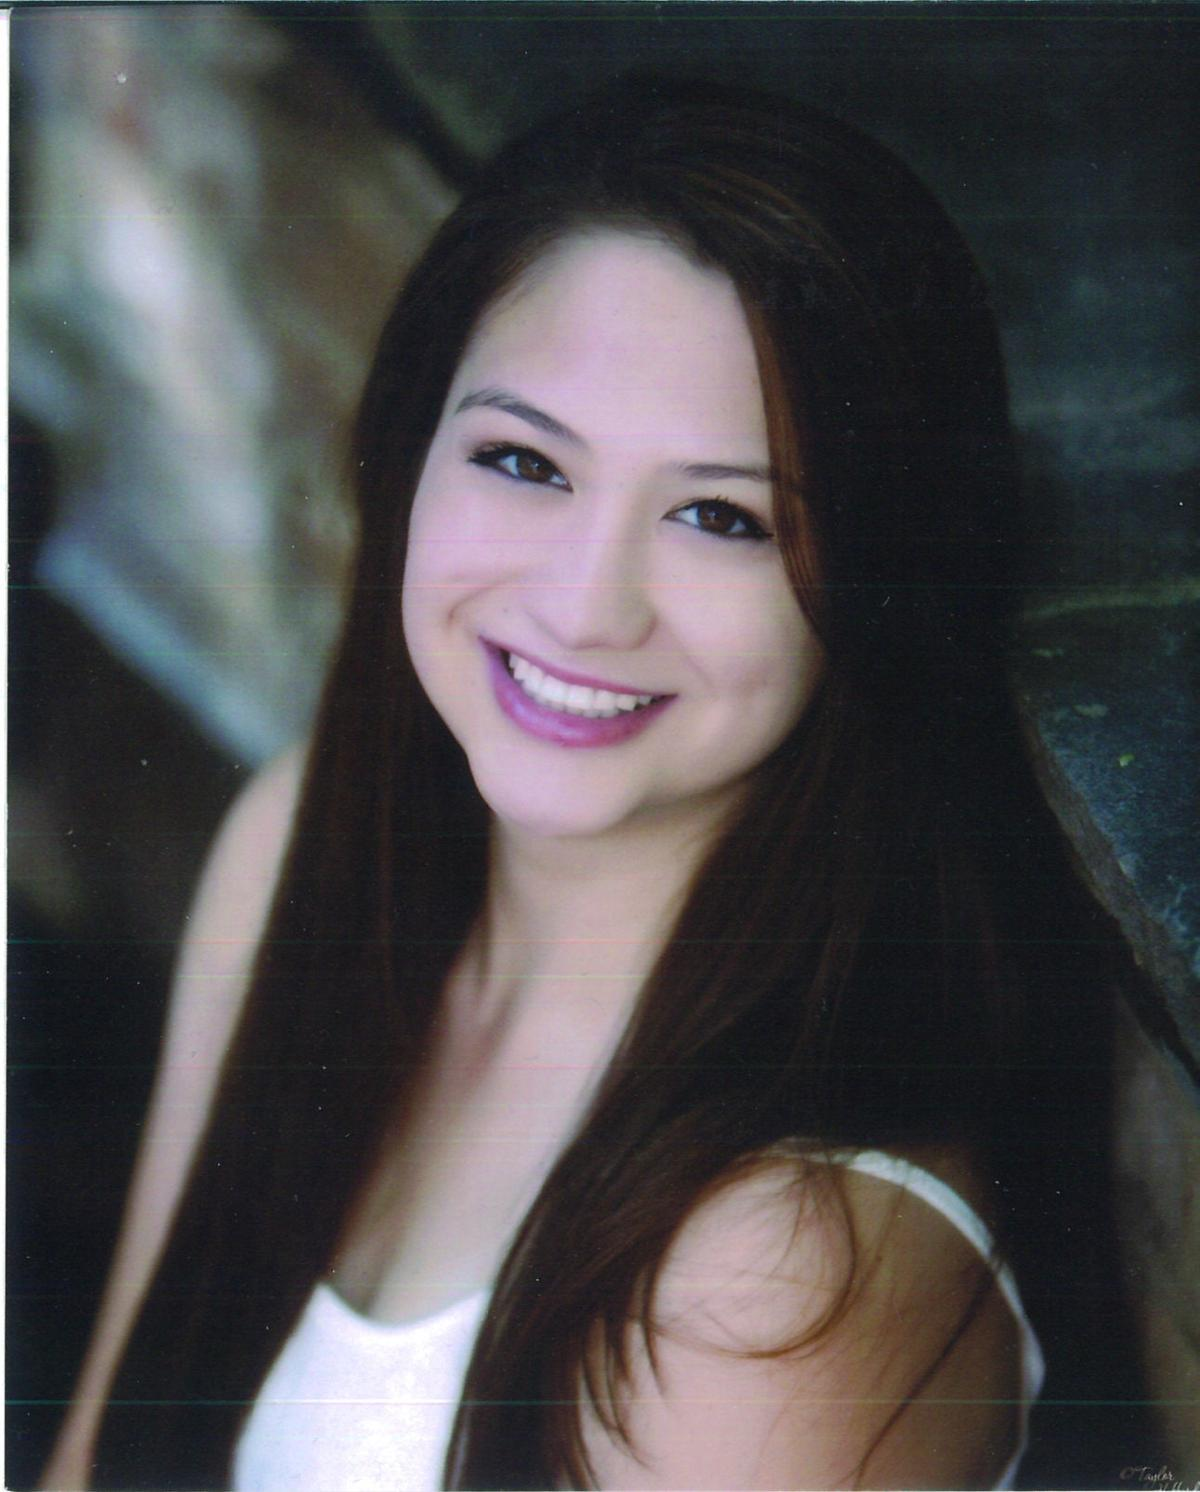 Ariel Nicole Crabtree